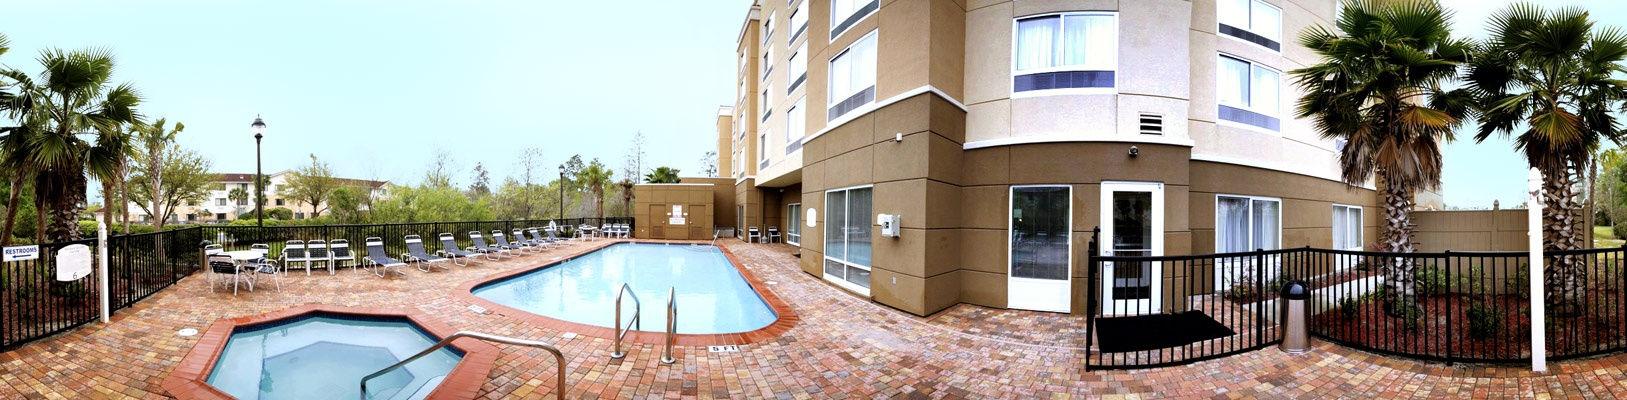 Fairfield Inn & Suites by Marriott Jacksonville Butler Boulevard image 15